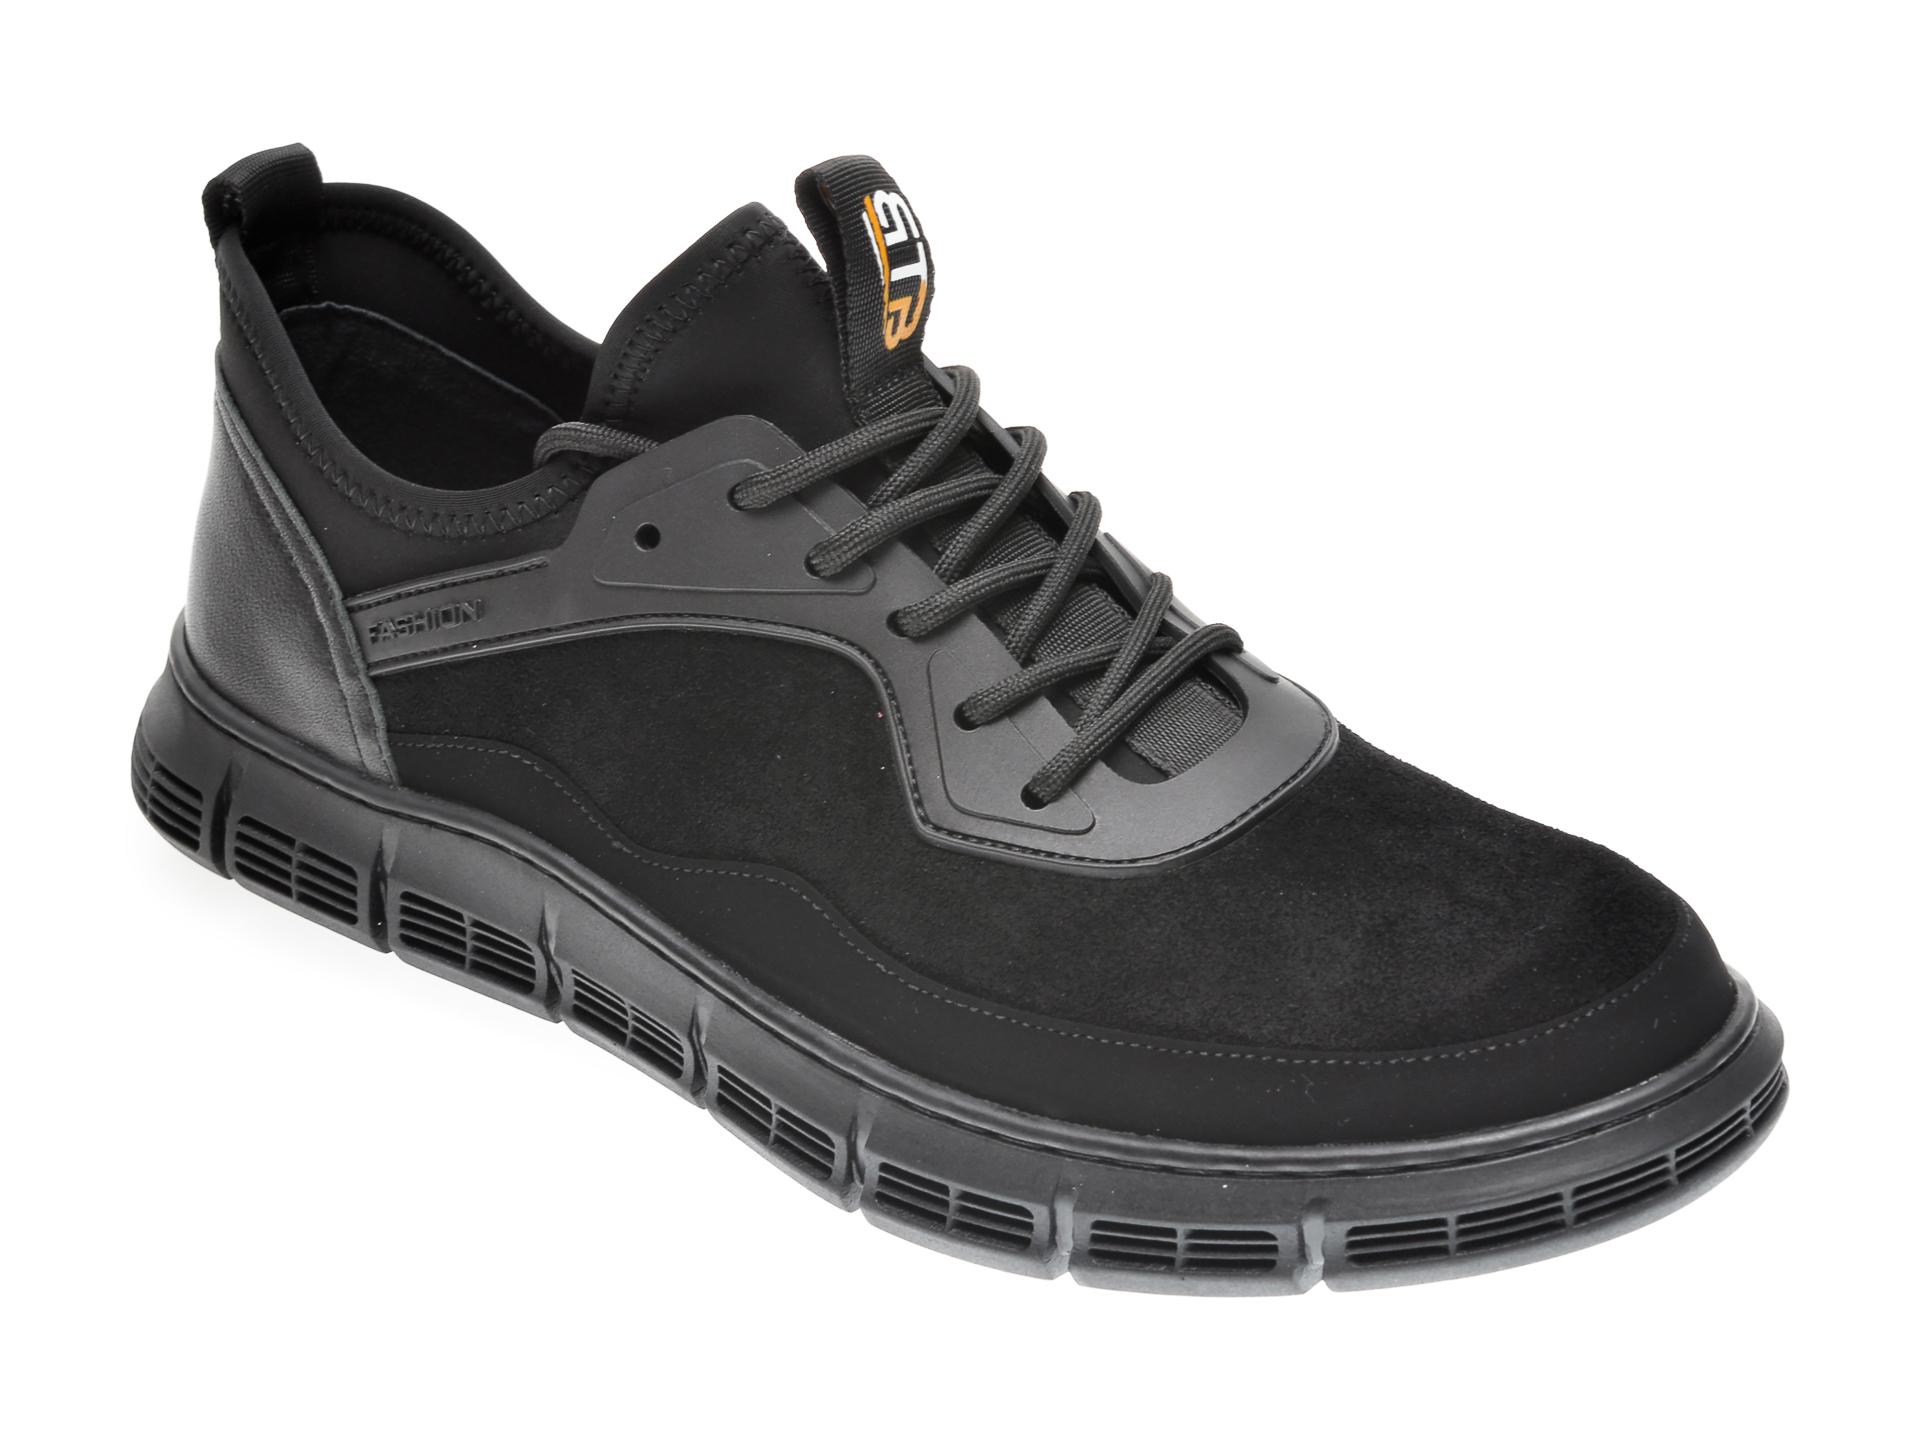 Pantofi BITE THE BULLET negri, YD99520, din piele ecologica imagine